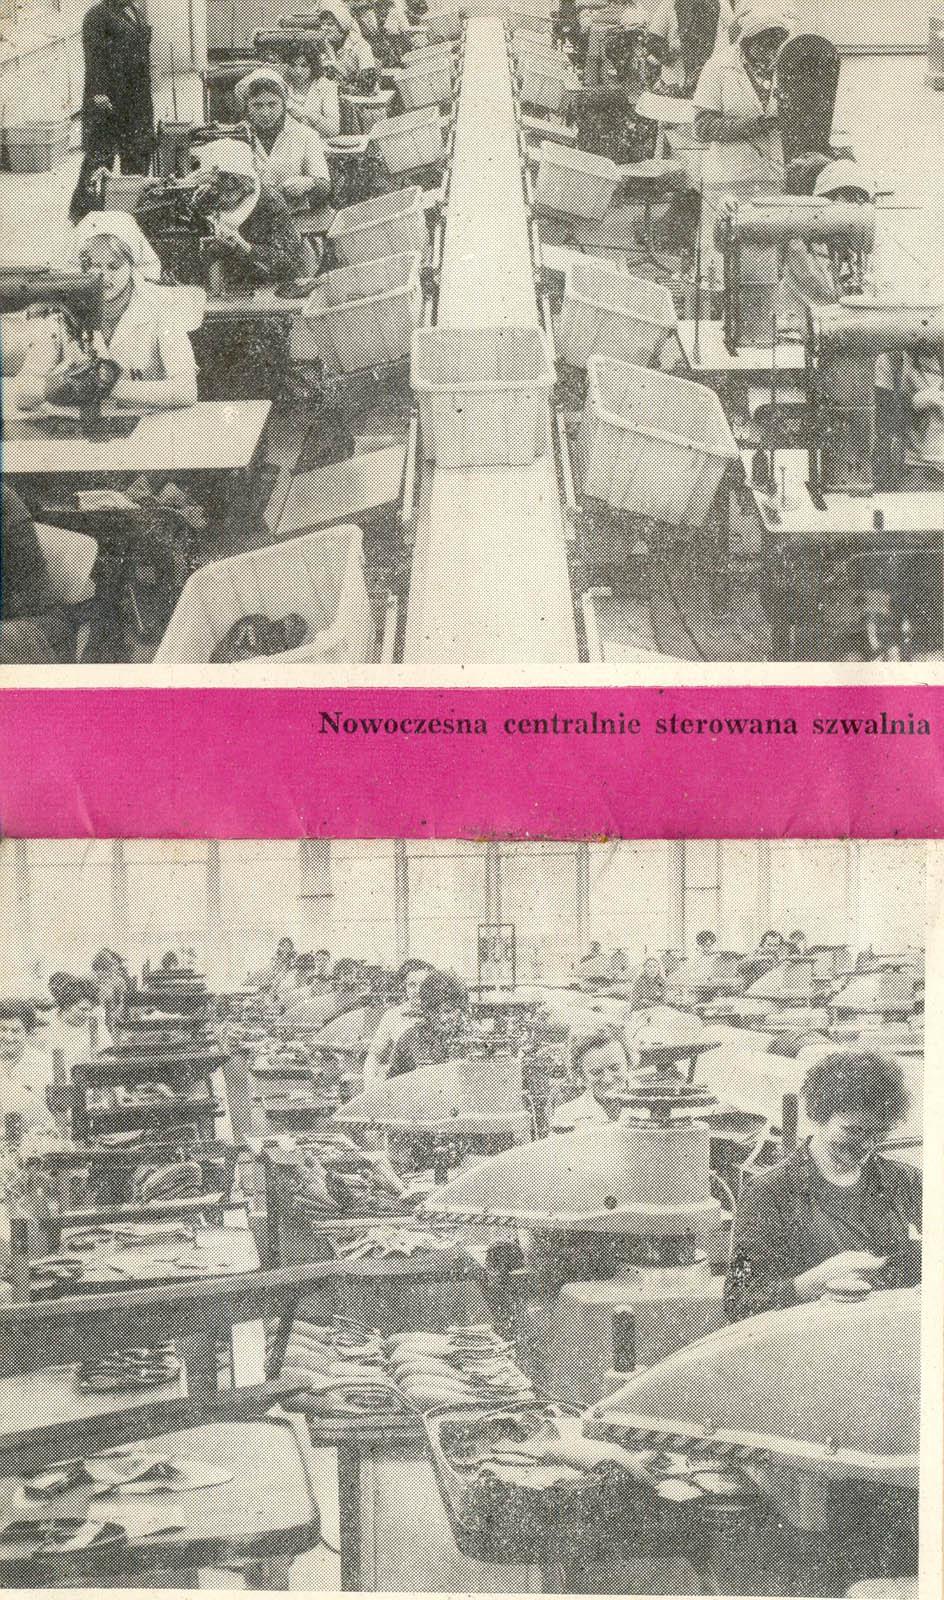 Bata Factory PZPS 1932-77 Tomasz Batta Memorial House